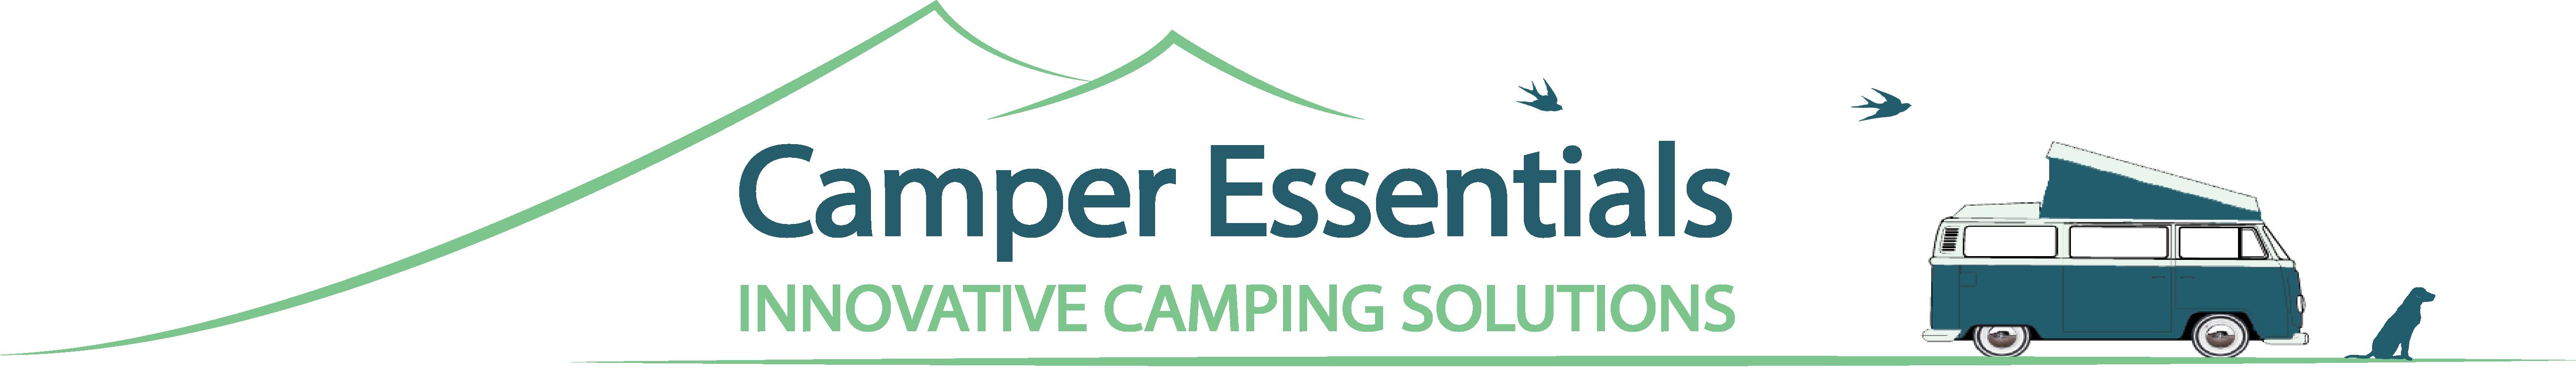 Camper Essentials